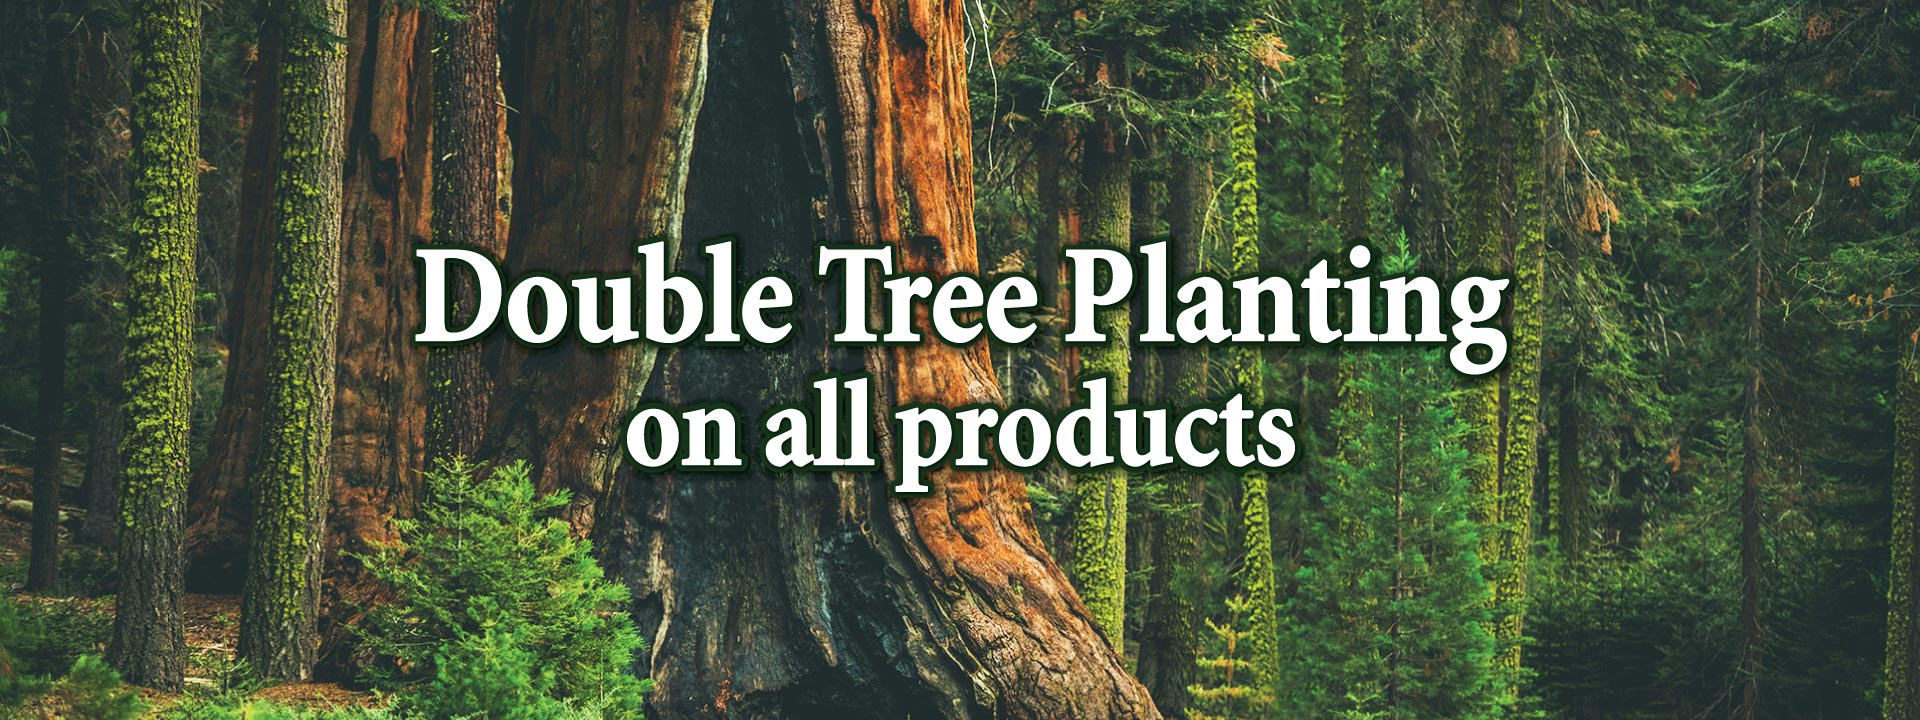 double-tree-planting